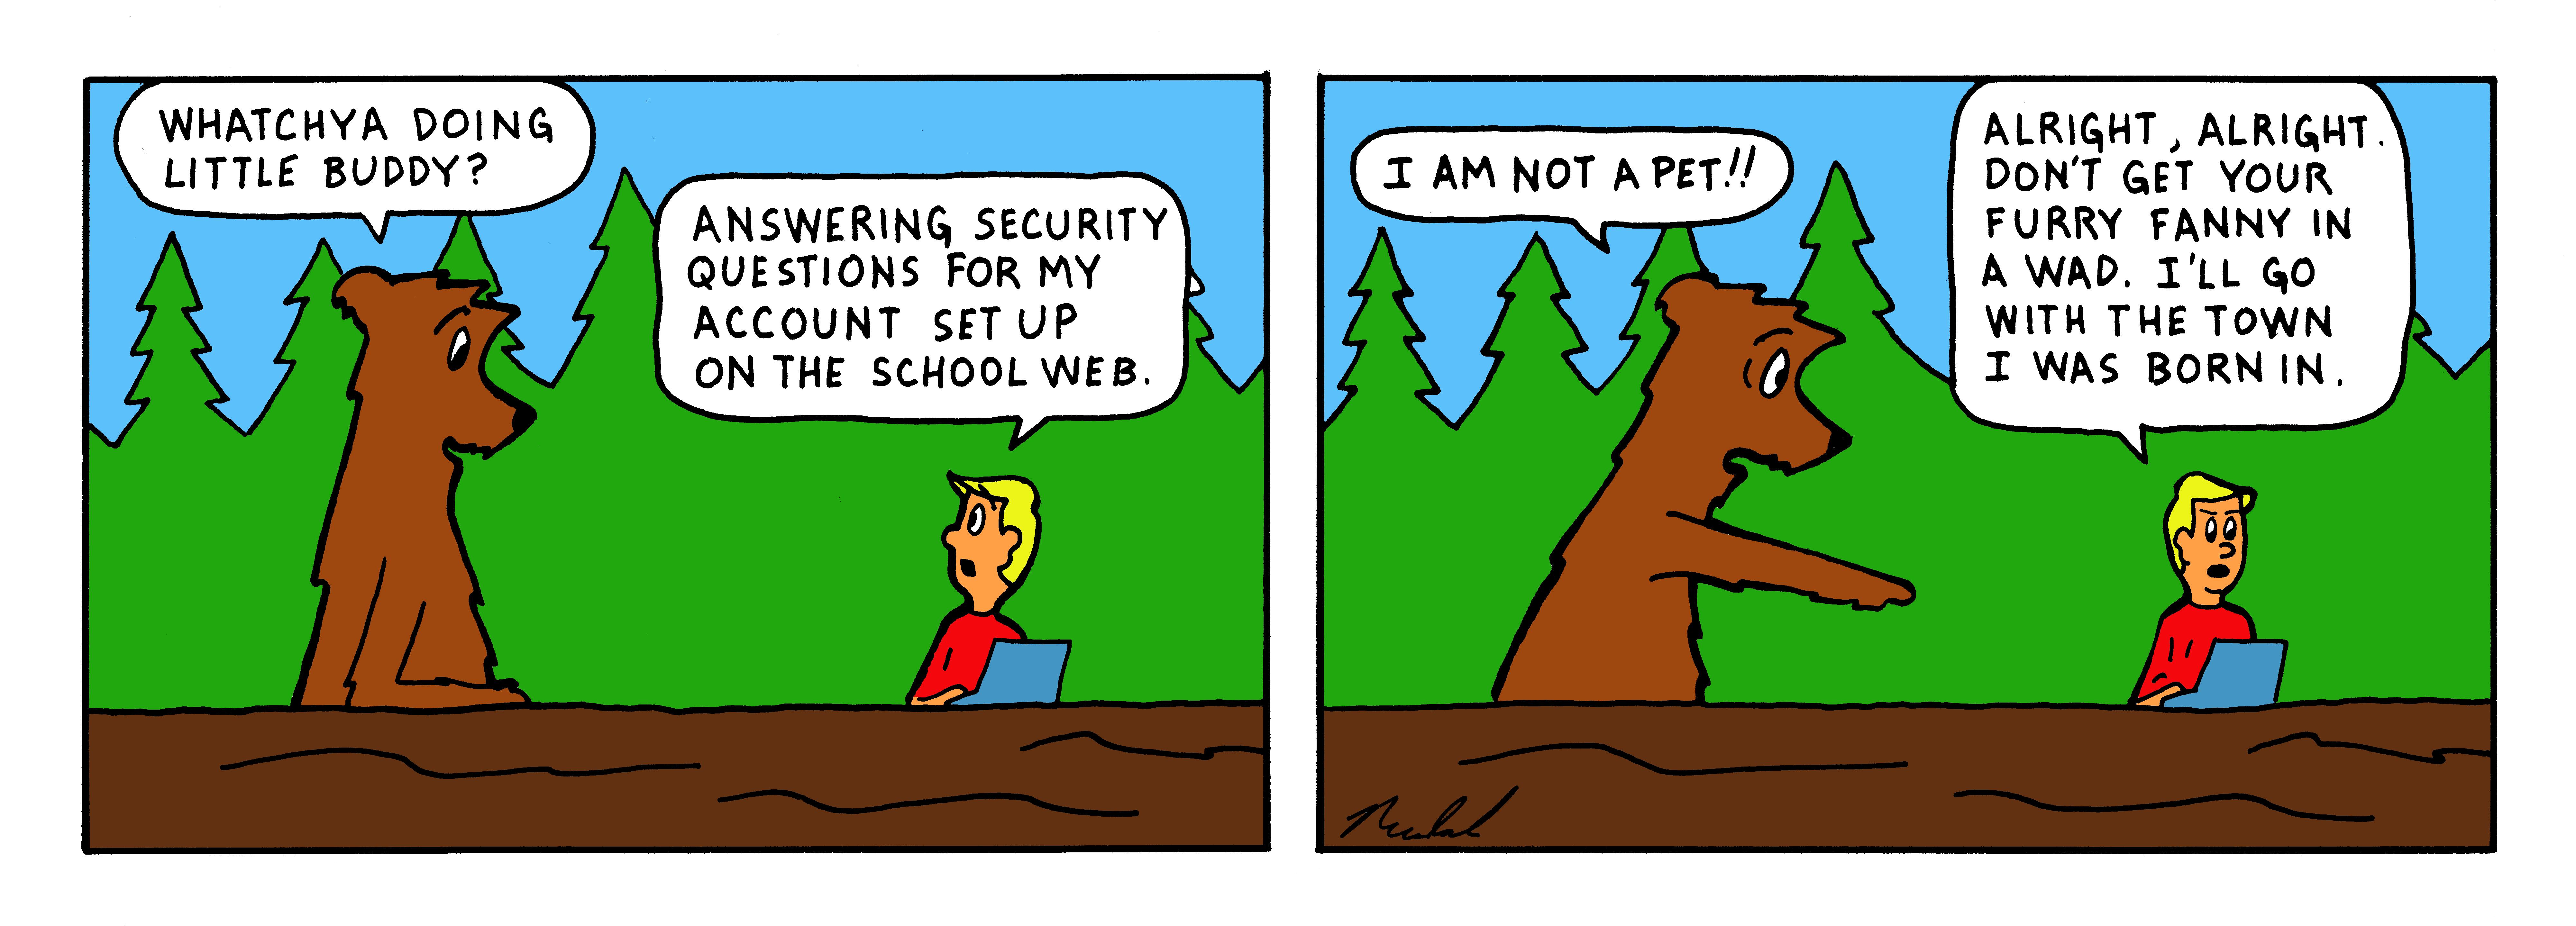 121 - color strip - security questions